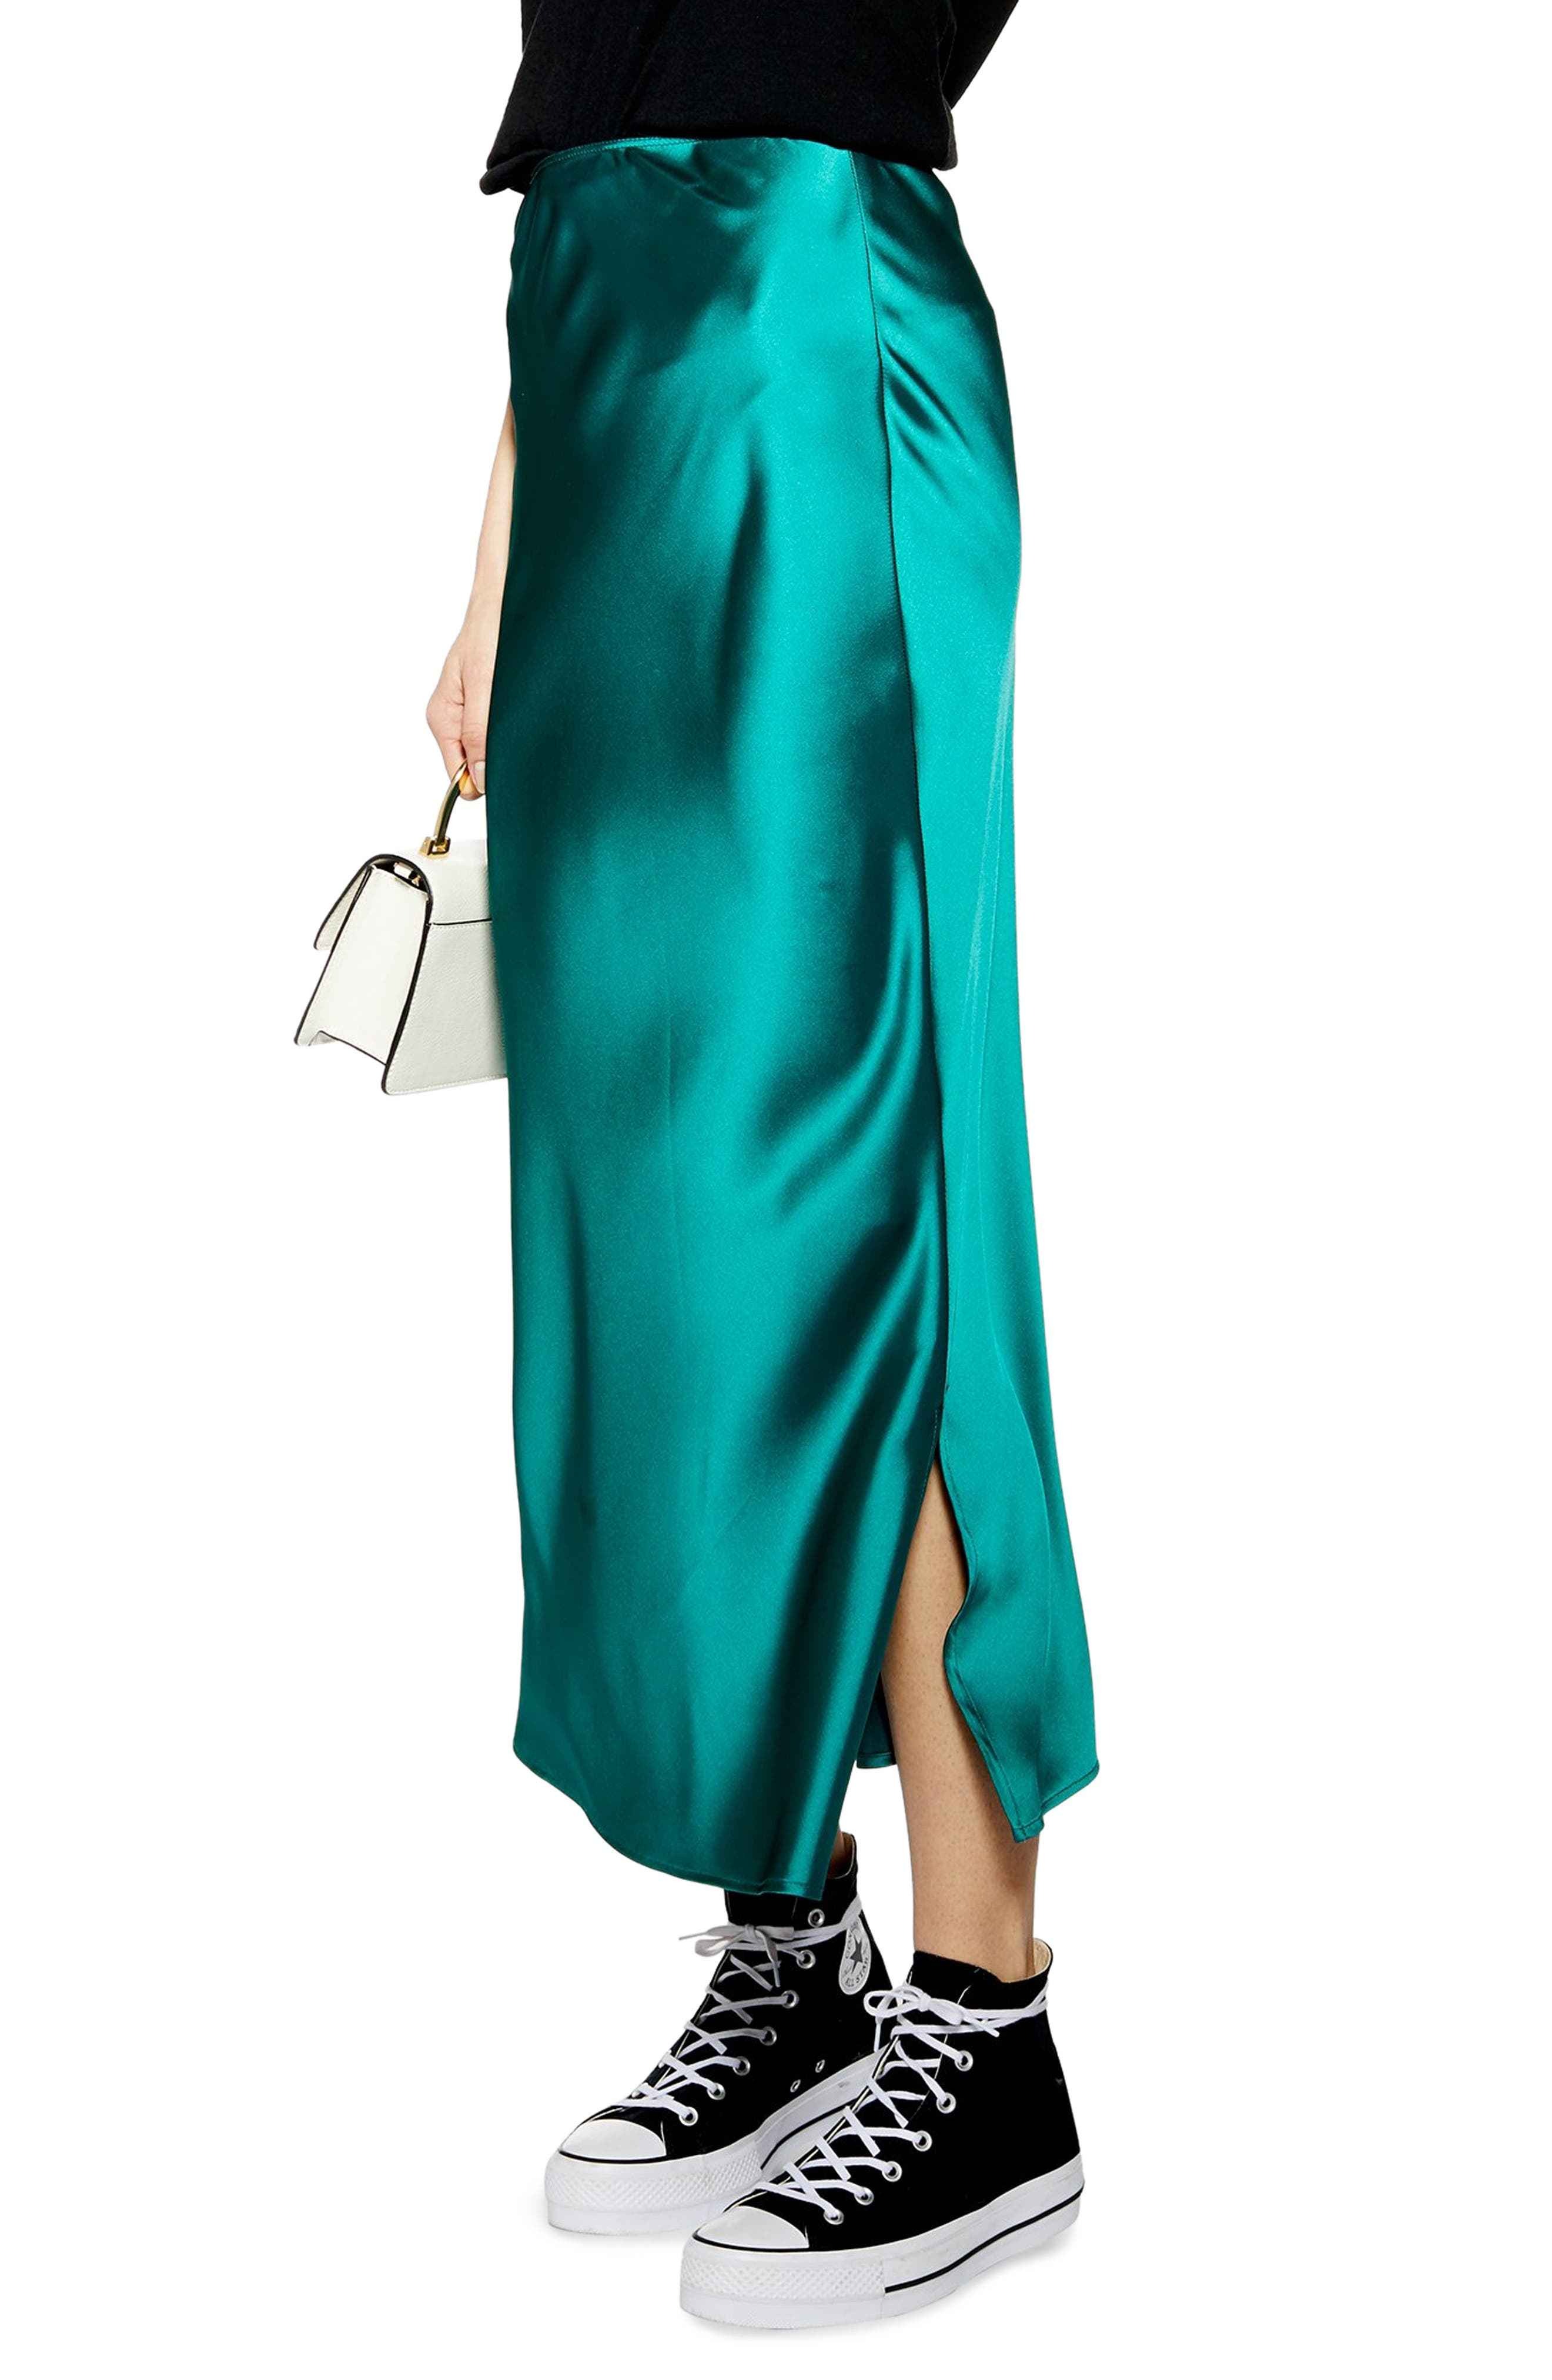 Topshop Split Side Bias Midi Skirt, US (fits like 0-2) - Green